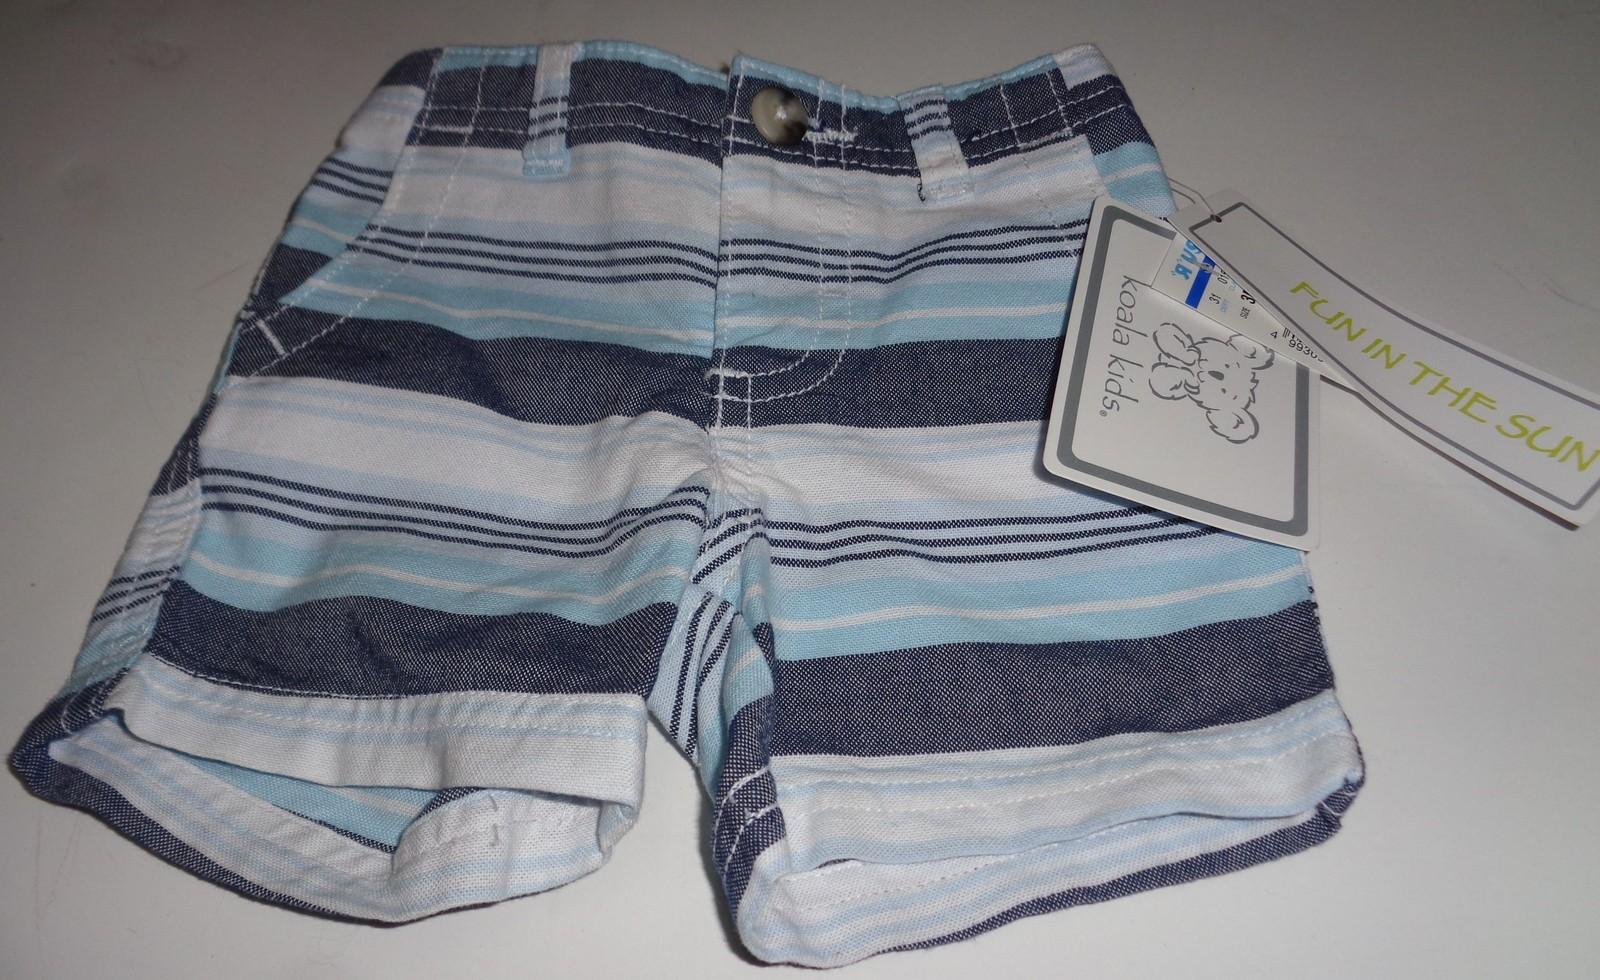 Koala Kids Fun in The Sun Infant Shorts NWT Sz 3 Months Blue Striped